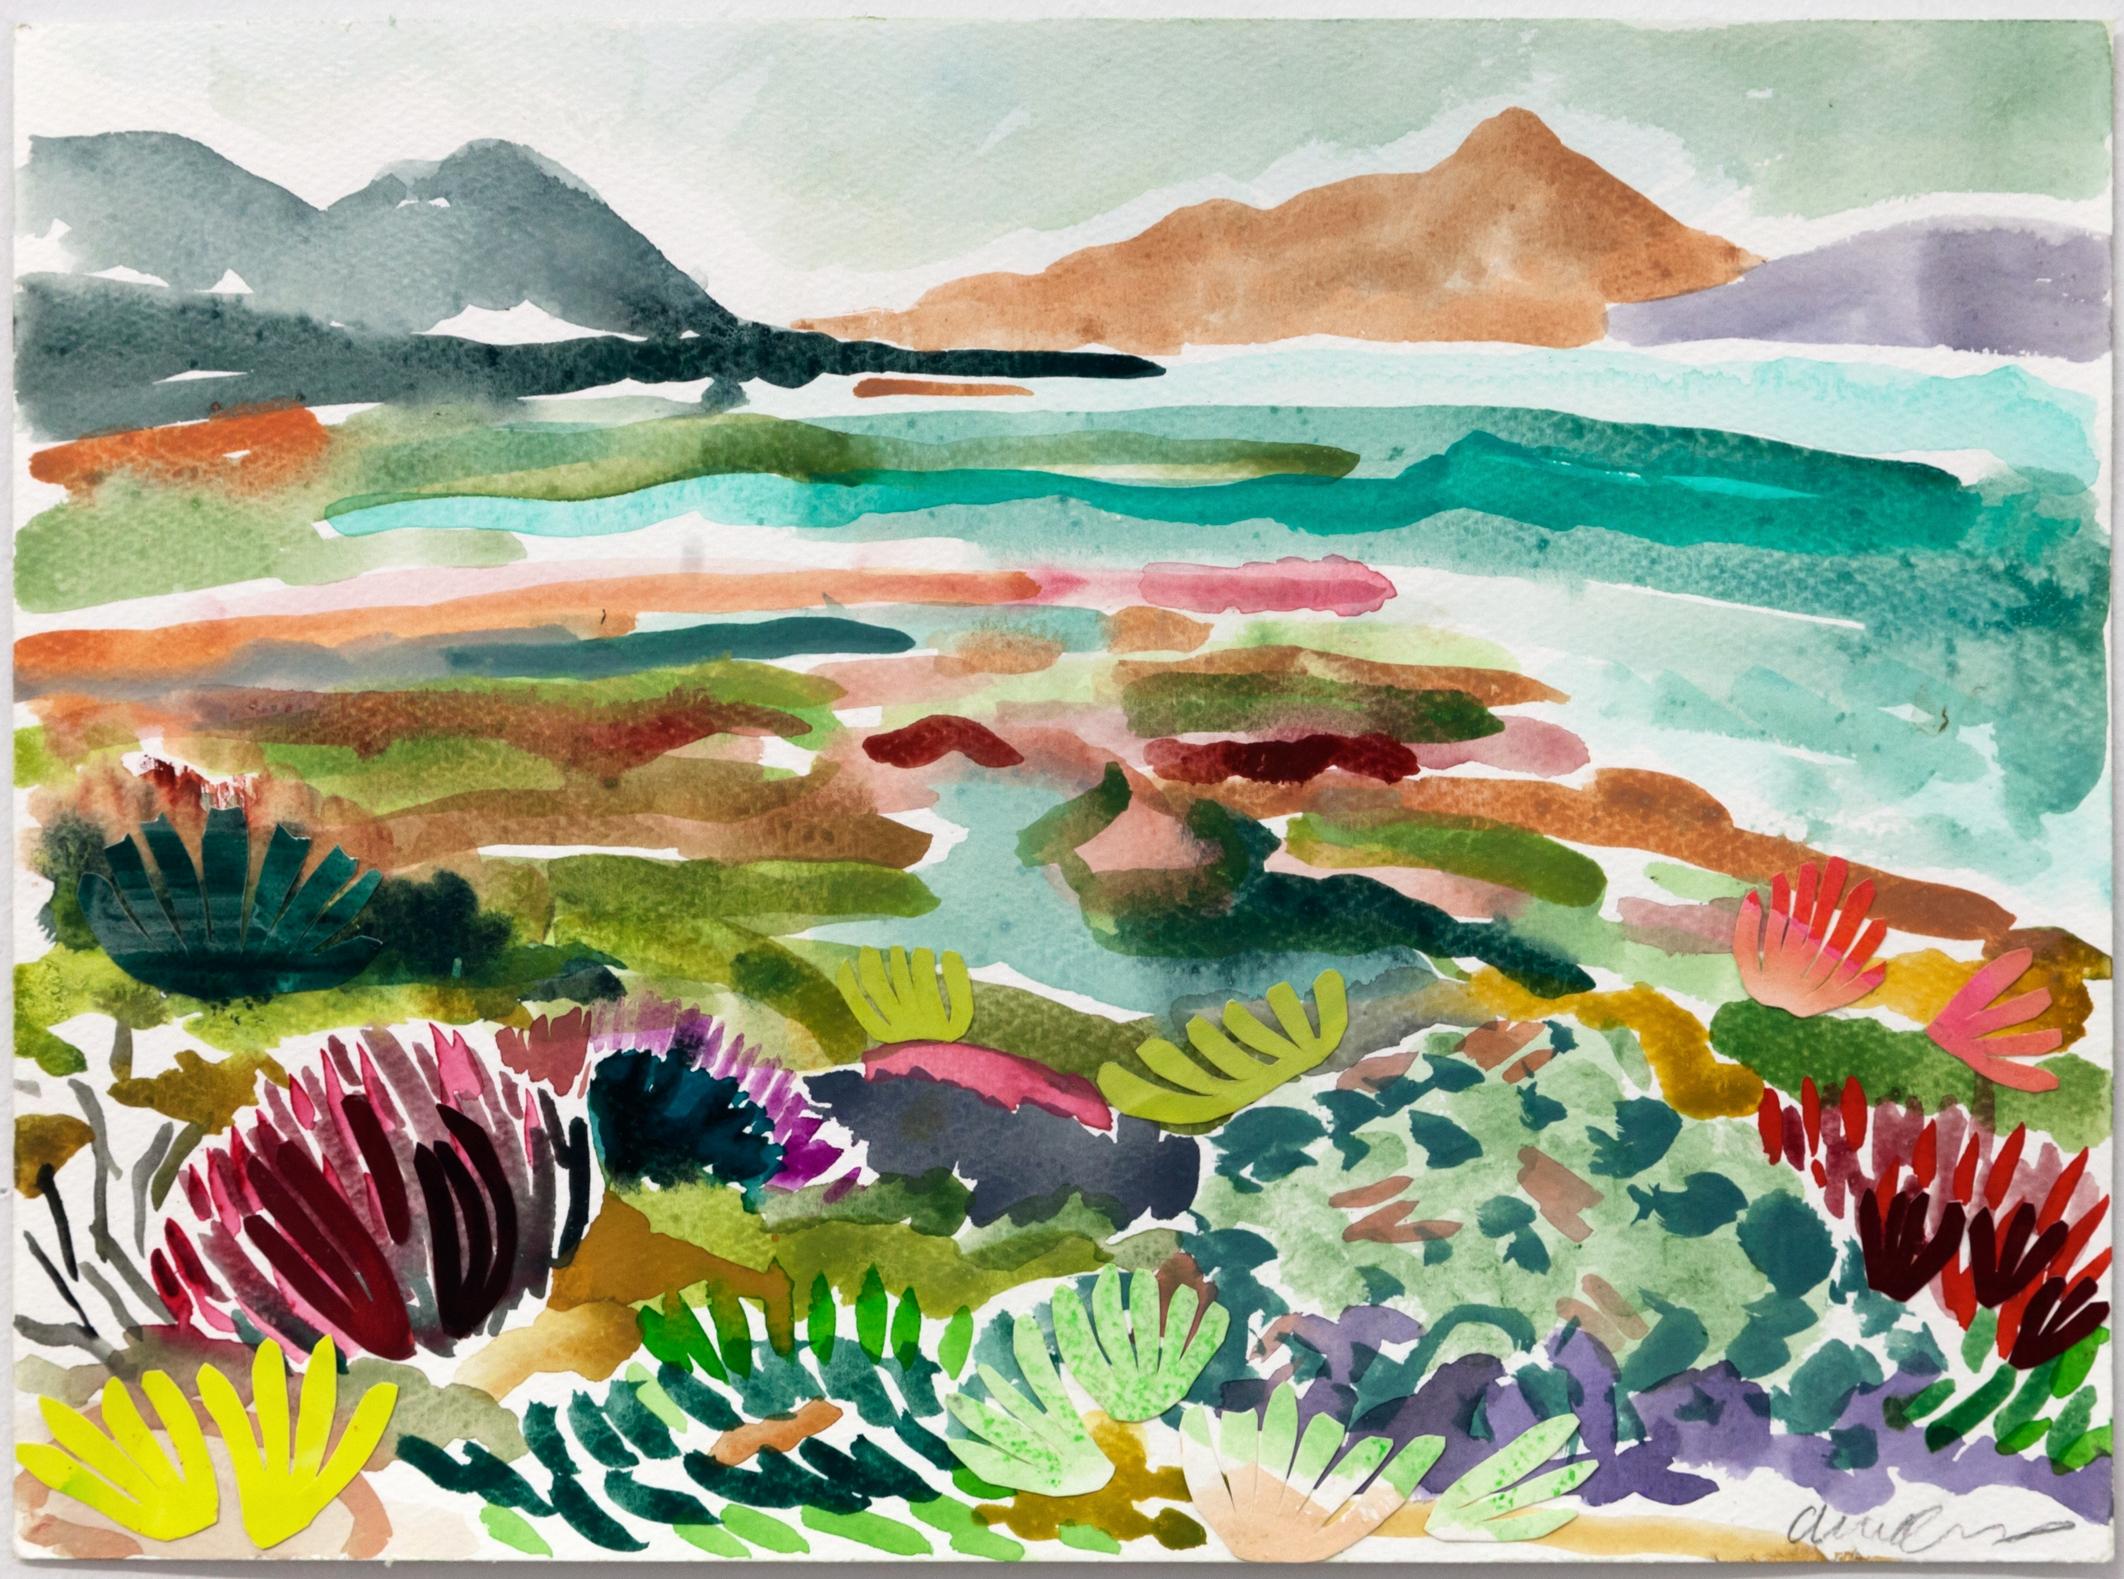 Fynbos Landscape iii